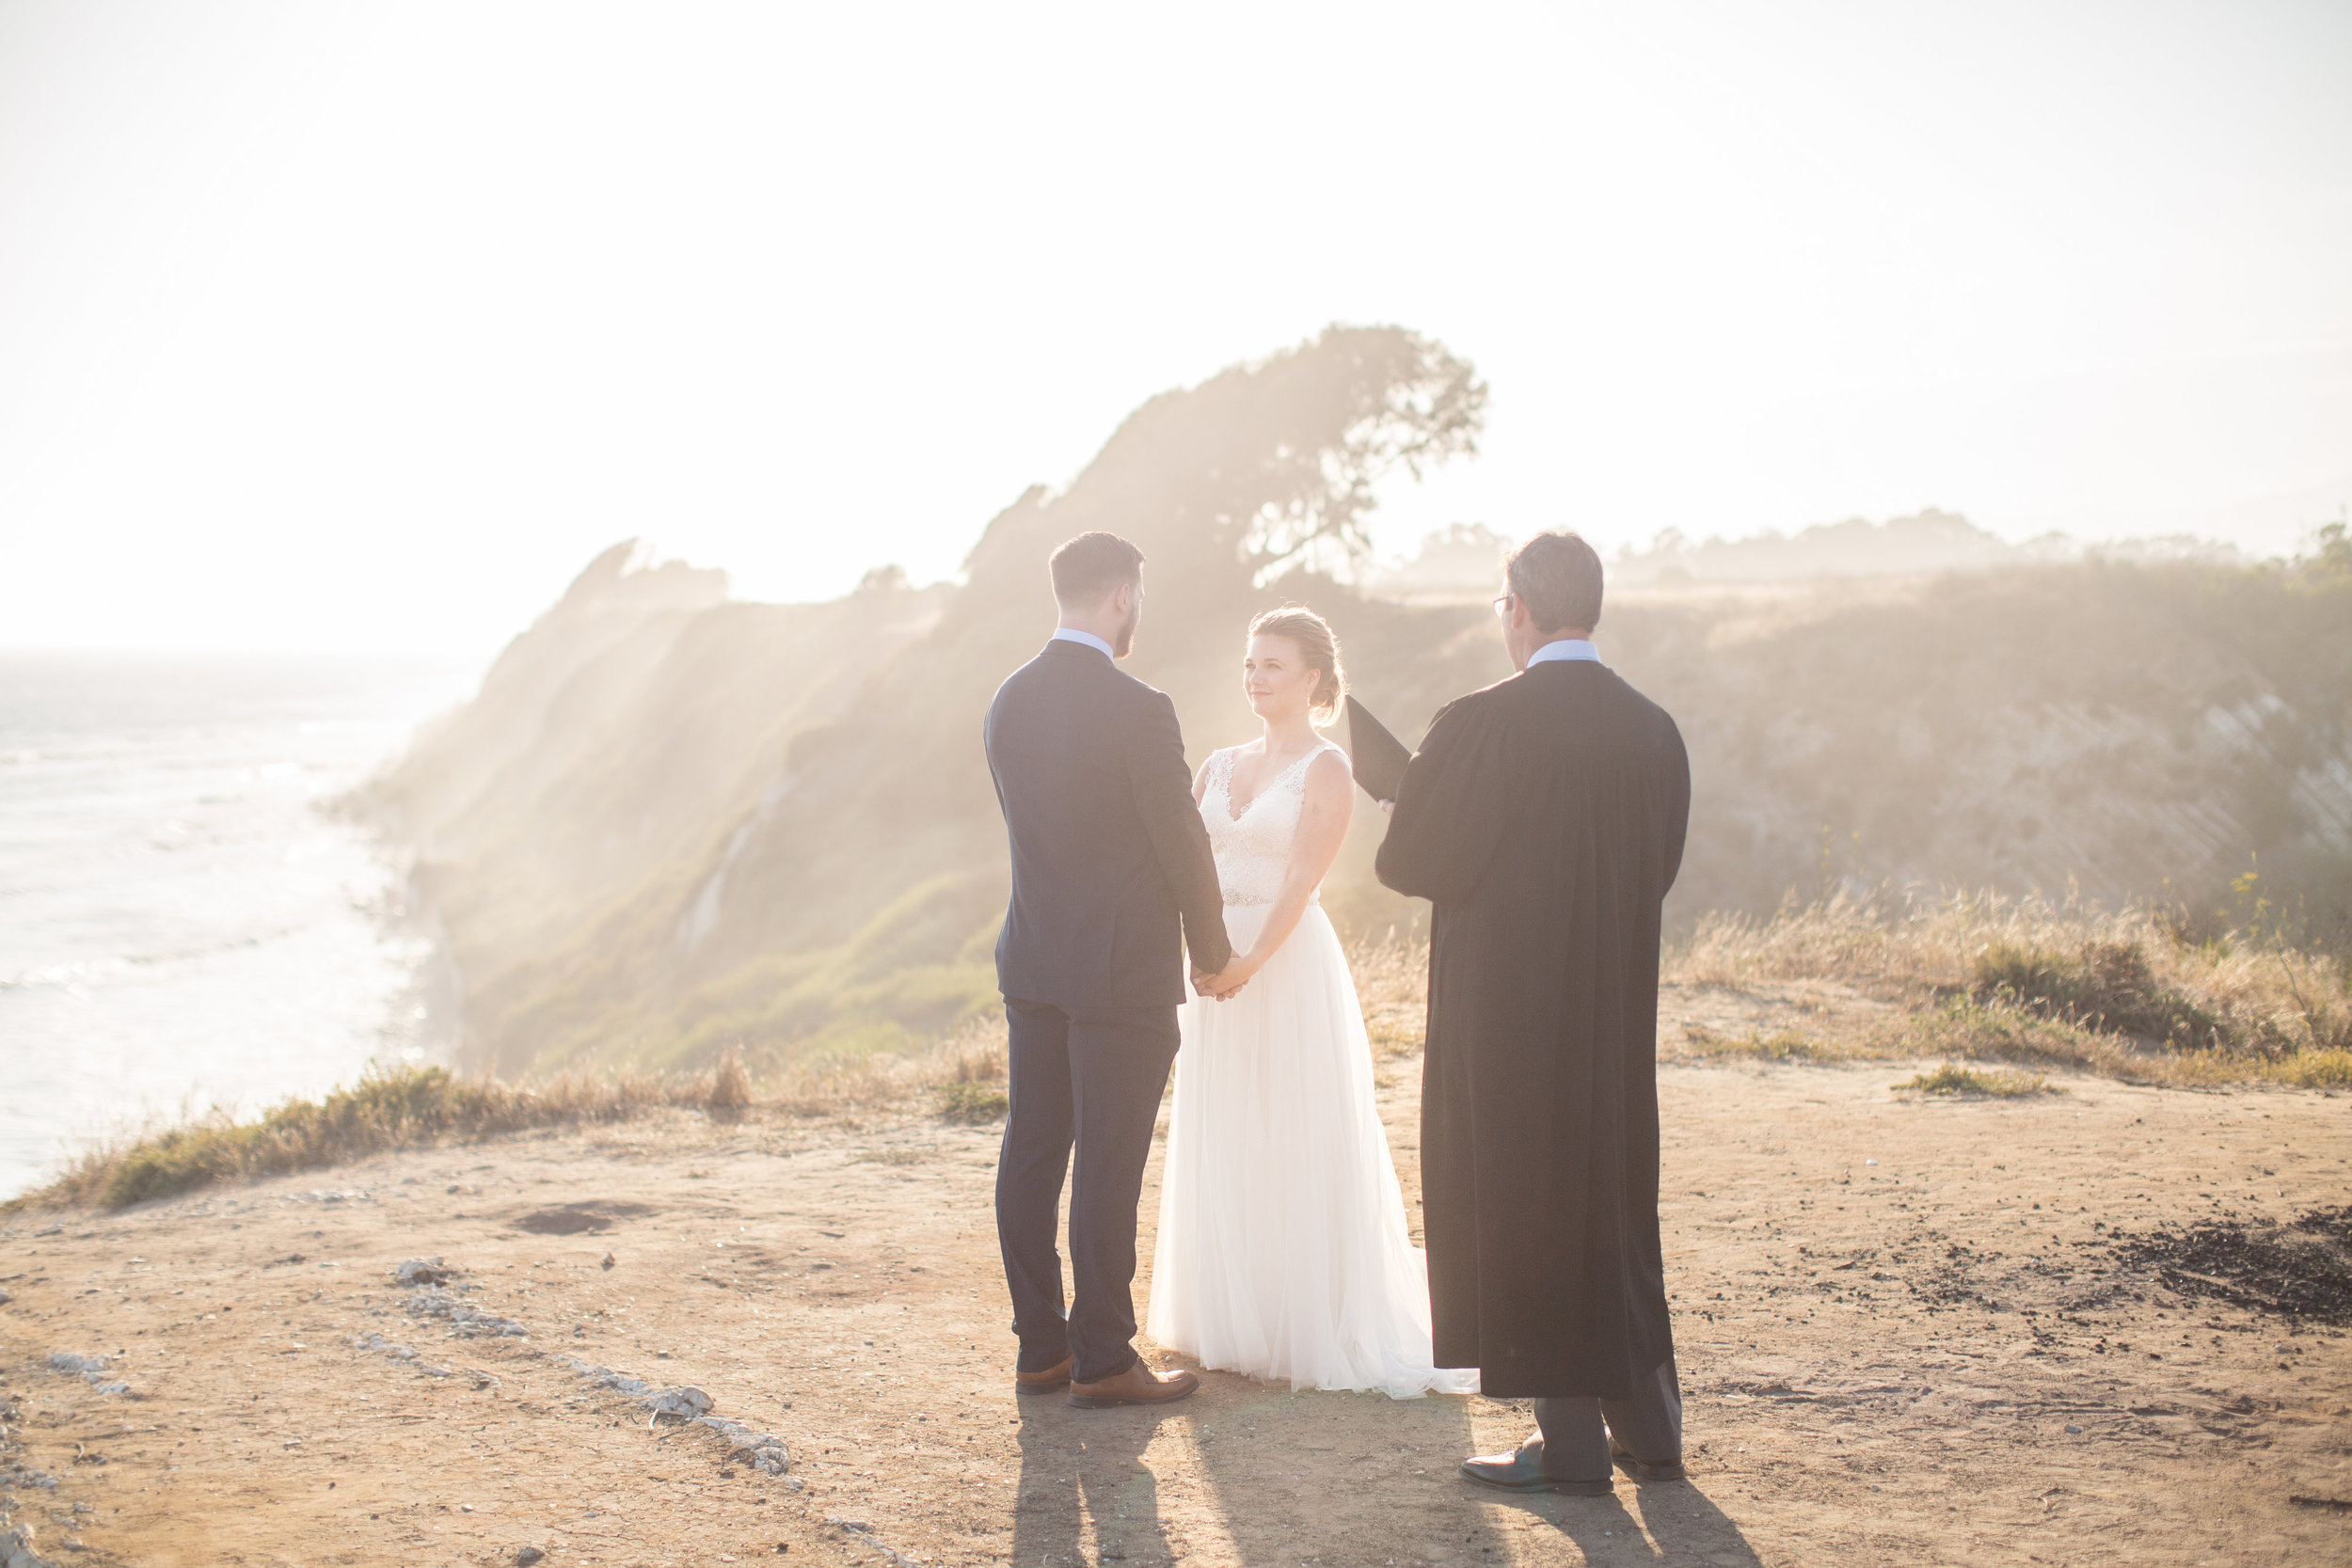 santa-barbara-elopement-elope-wedding-planning-planner-coordinator-day-of-rustic-ellwood-bluffs-beach-front-ocean-view (7).jpg